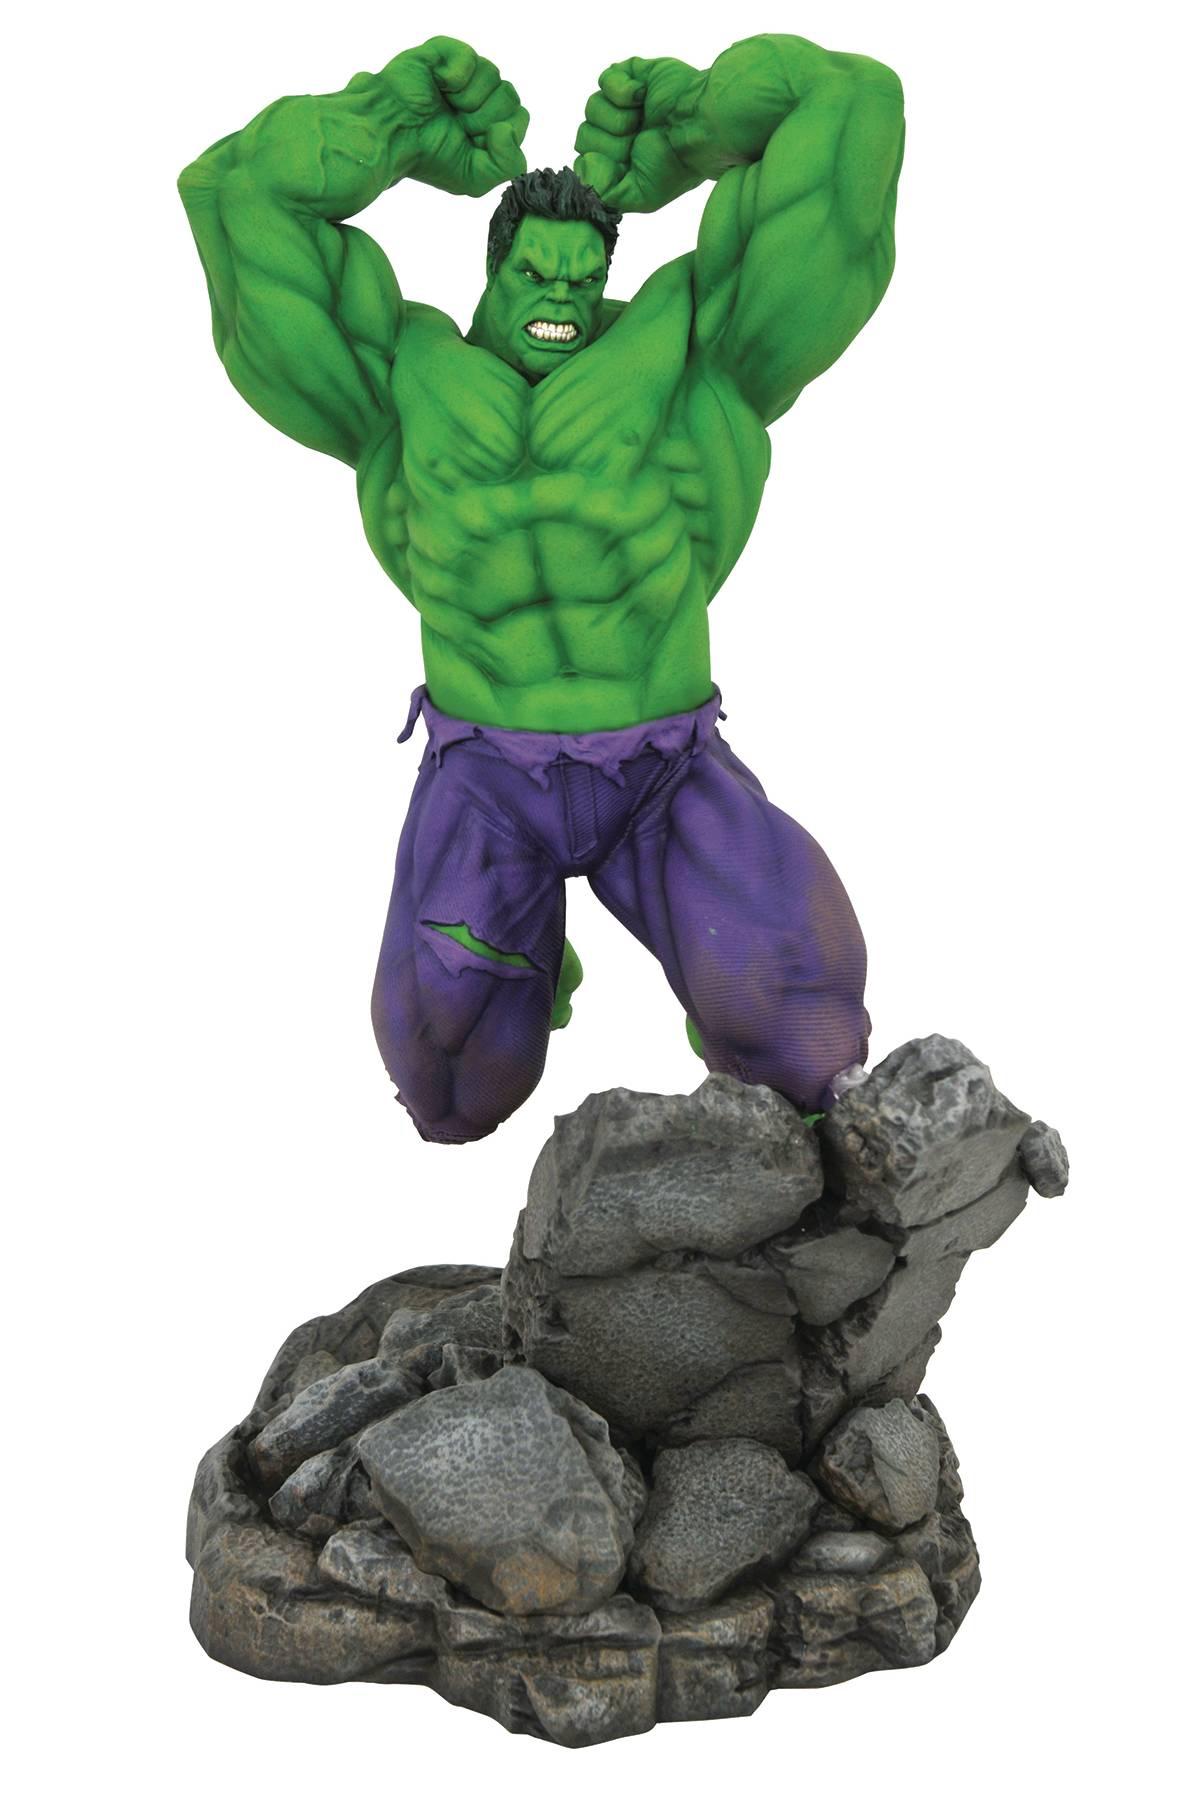 Marvel Premier Collection - Hulk Statue